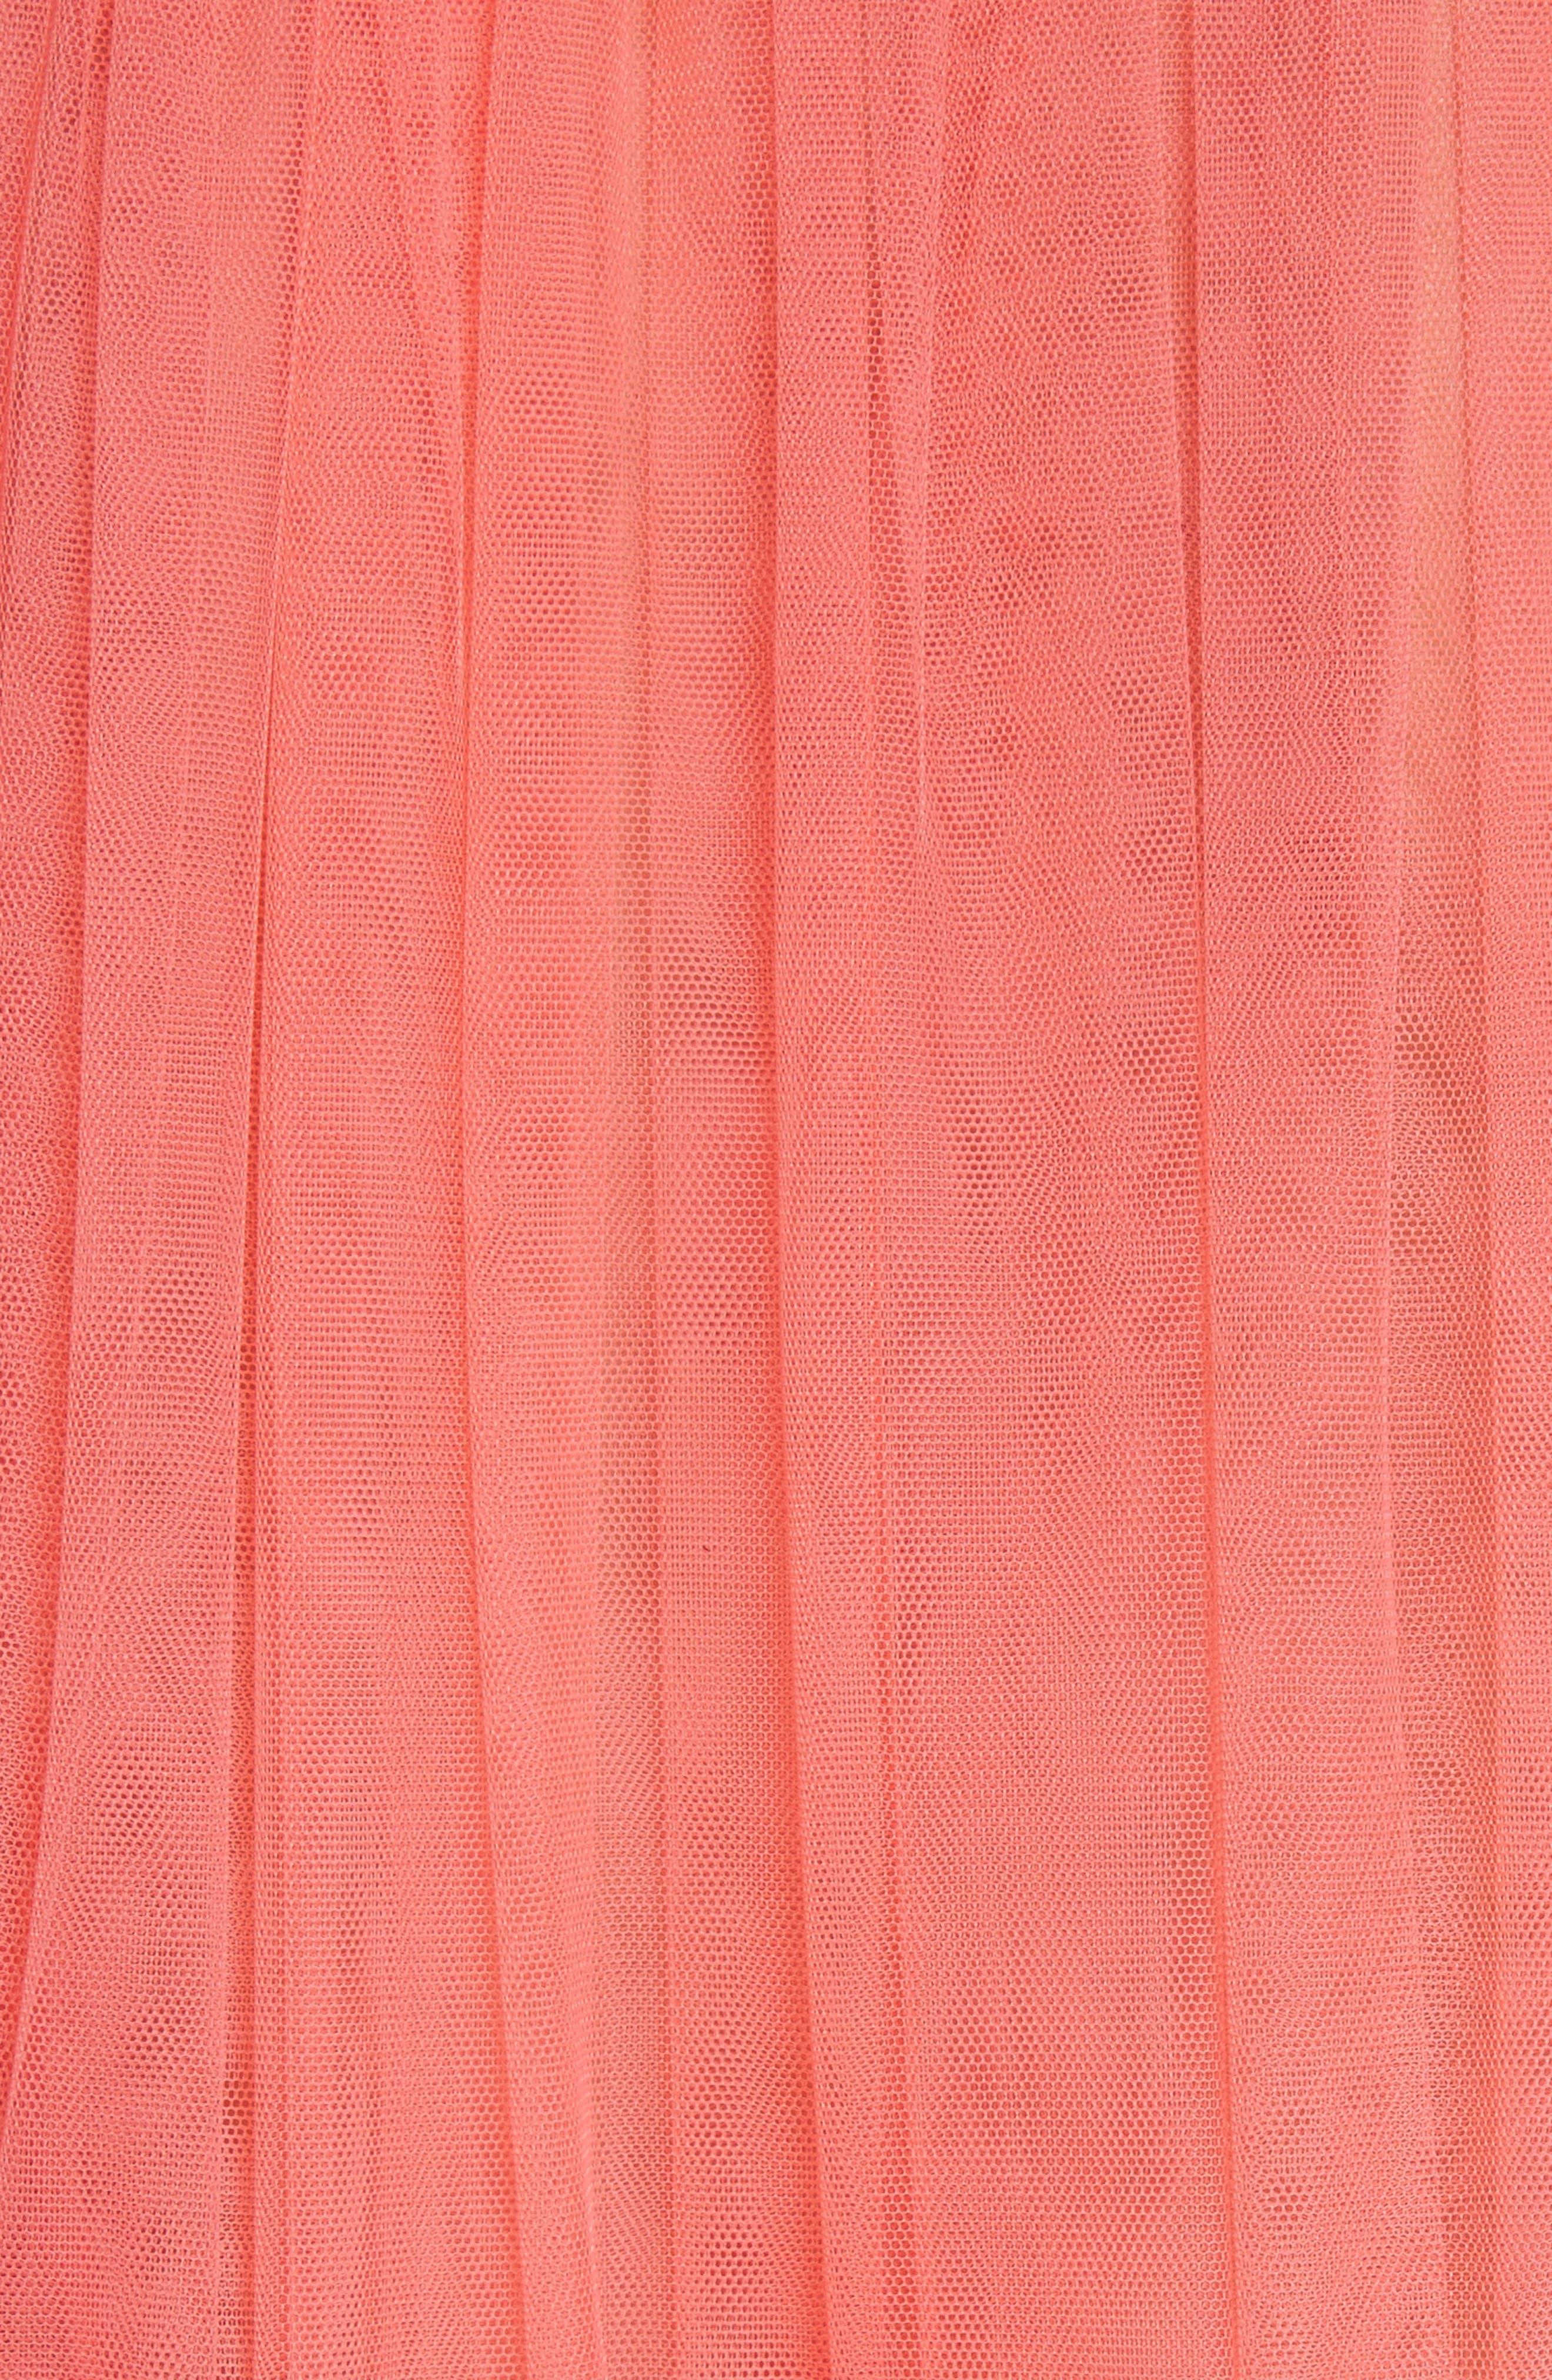 Alternate Image 5  - Molly Goddard Doris Embroidered Tulle Dress